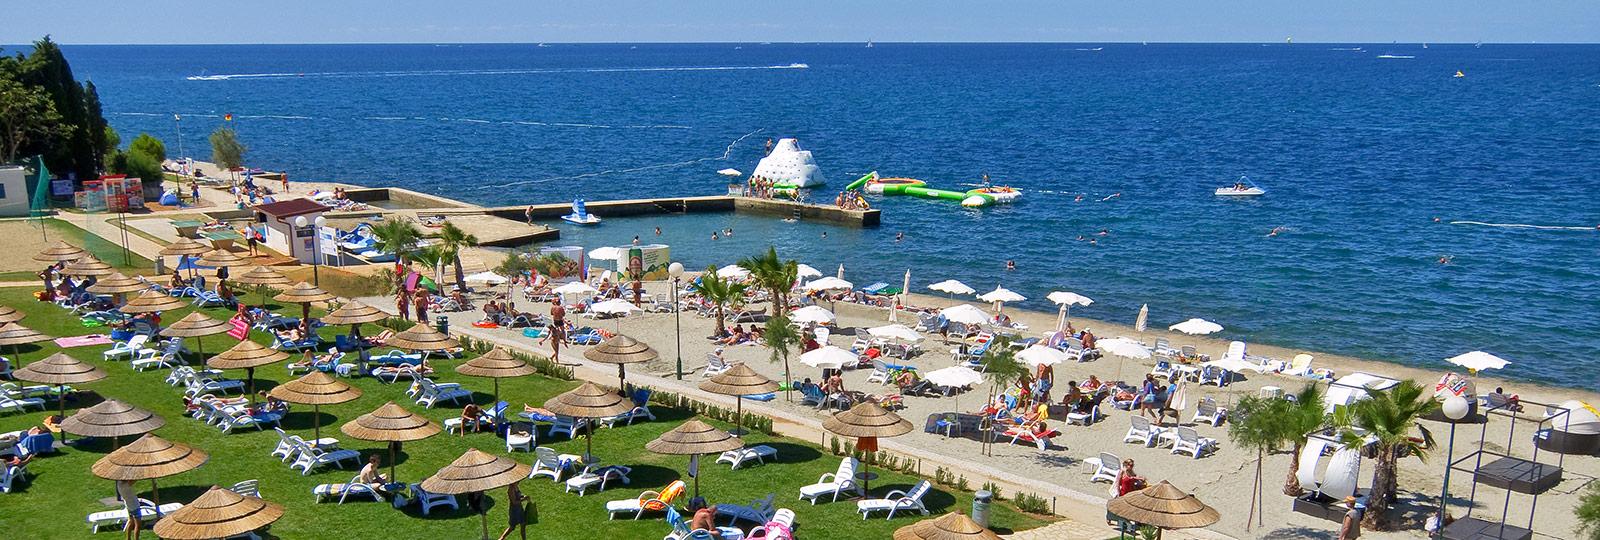 Slovenia Beach Property